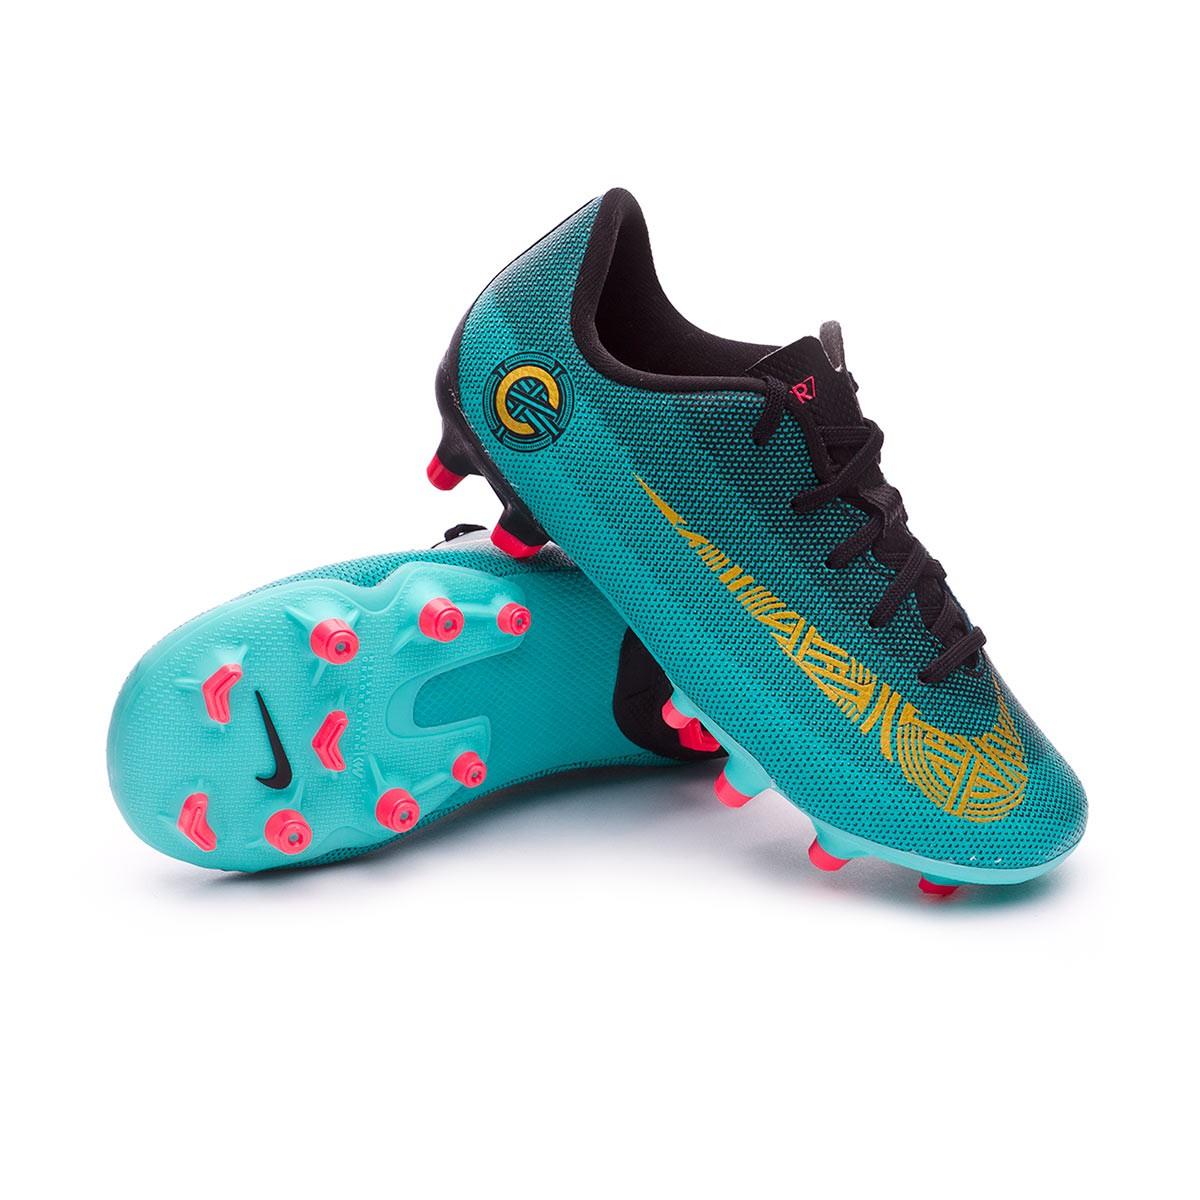 3ce9056ed Football Boots Nike Kids Mercurial Vapor XII Academy PS CR7 MG Clear ...